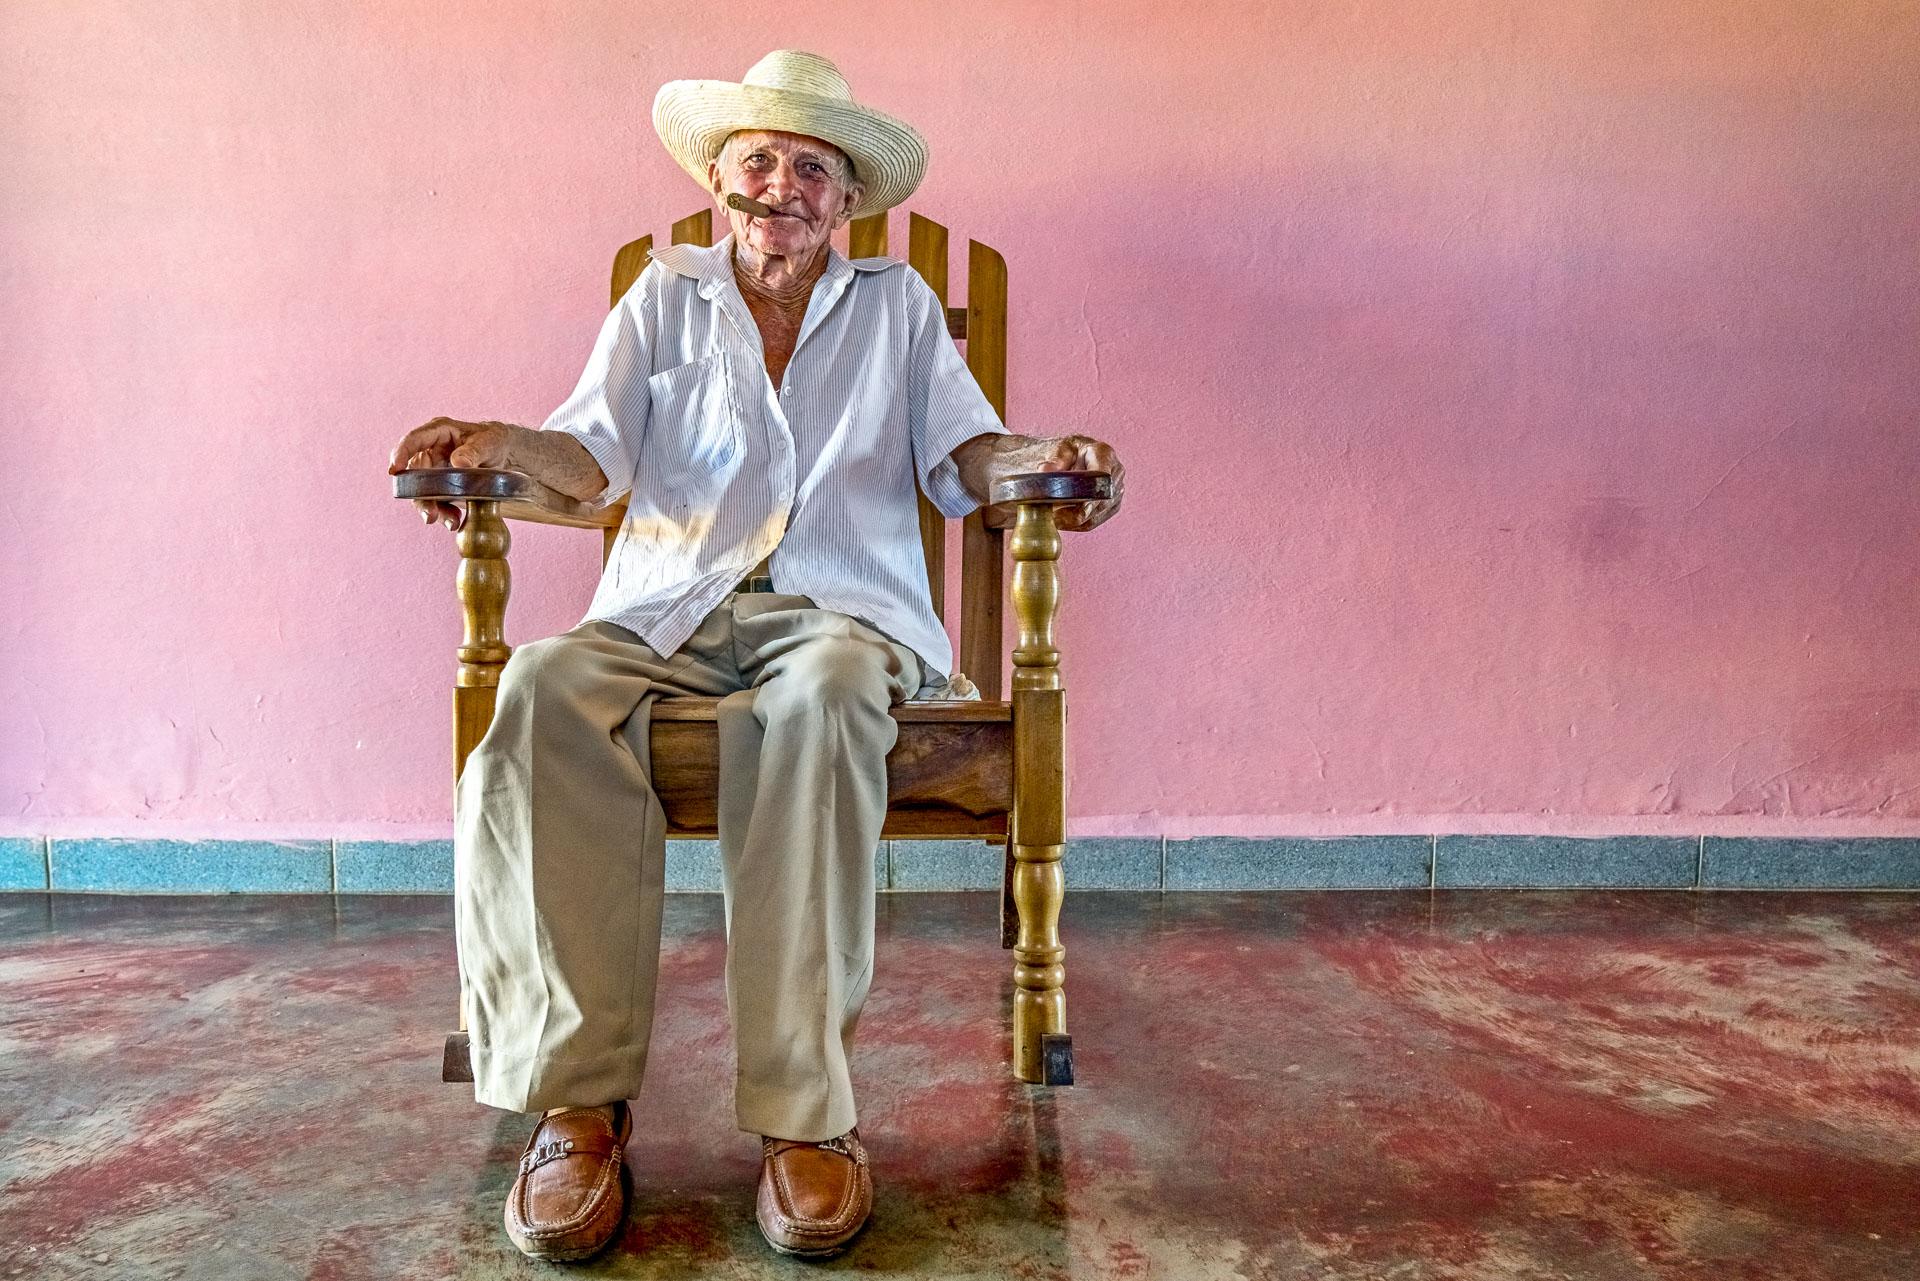 fotoreise-fotosafari-hd-2021-454-Kuba